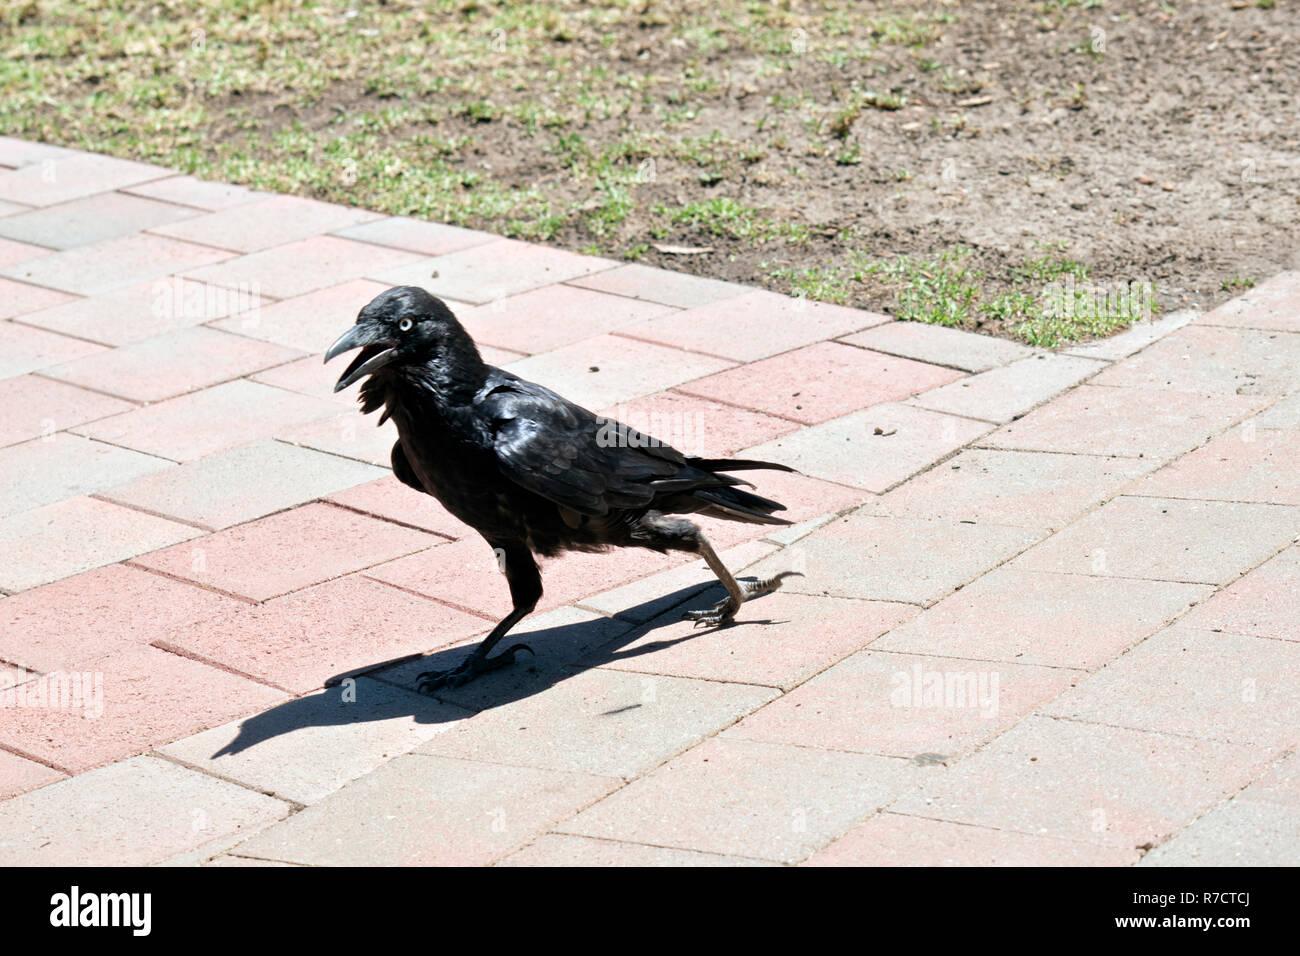 the Australian raven is walking on a brick path - Stock Image